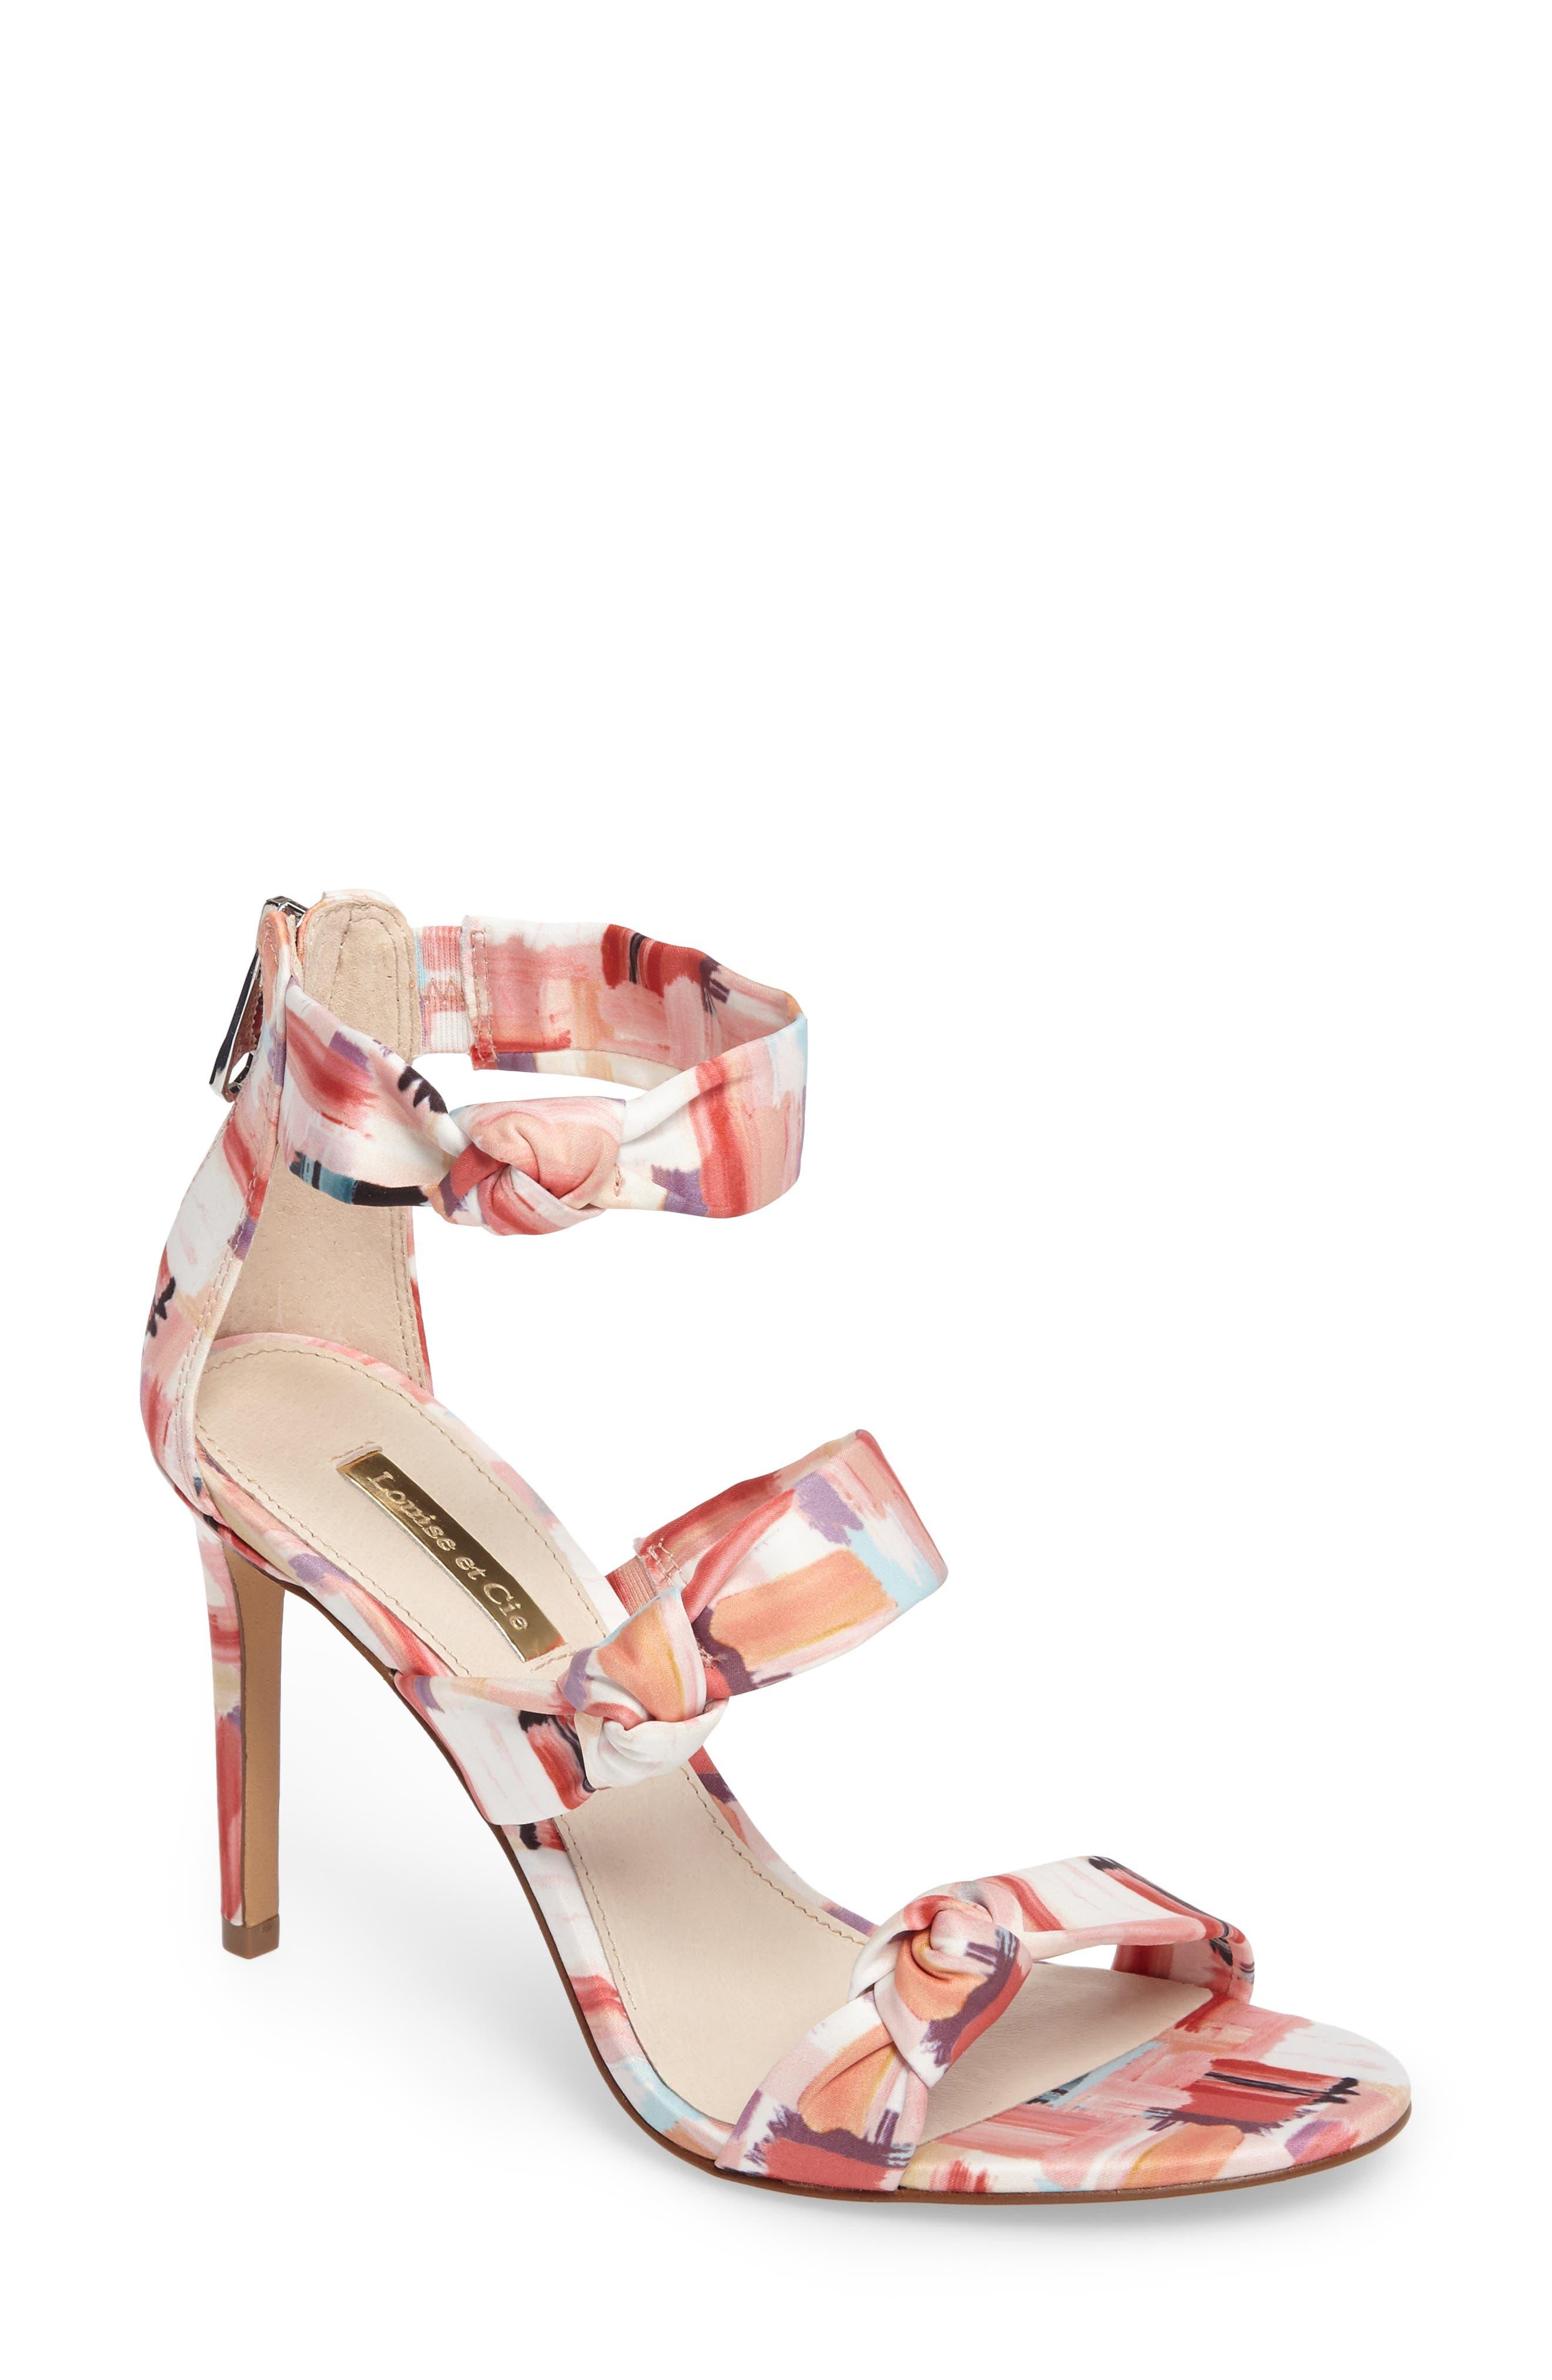 Klarissa Sandal,                         Main,                         color, Coral Multi Satin